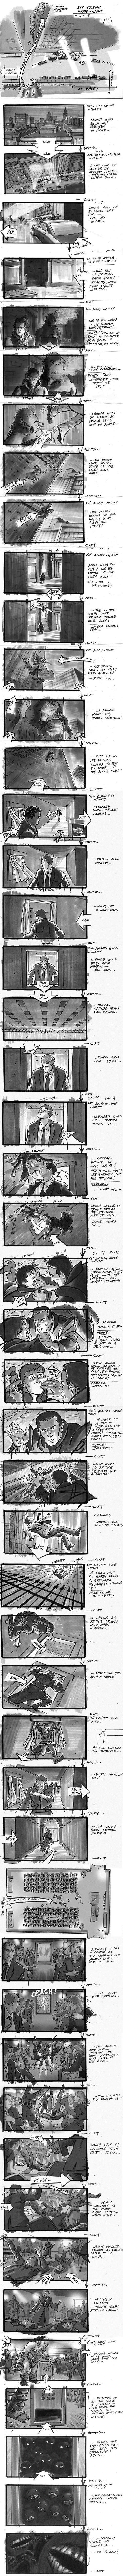 'Hellboy 2: The Golden Army'  Storyboard Artist: Josh Sheppard